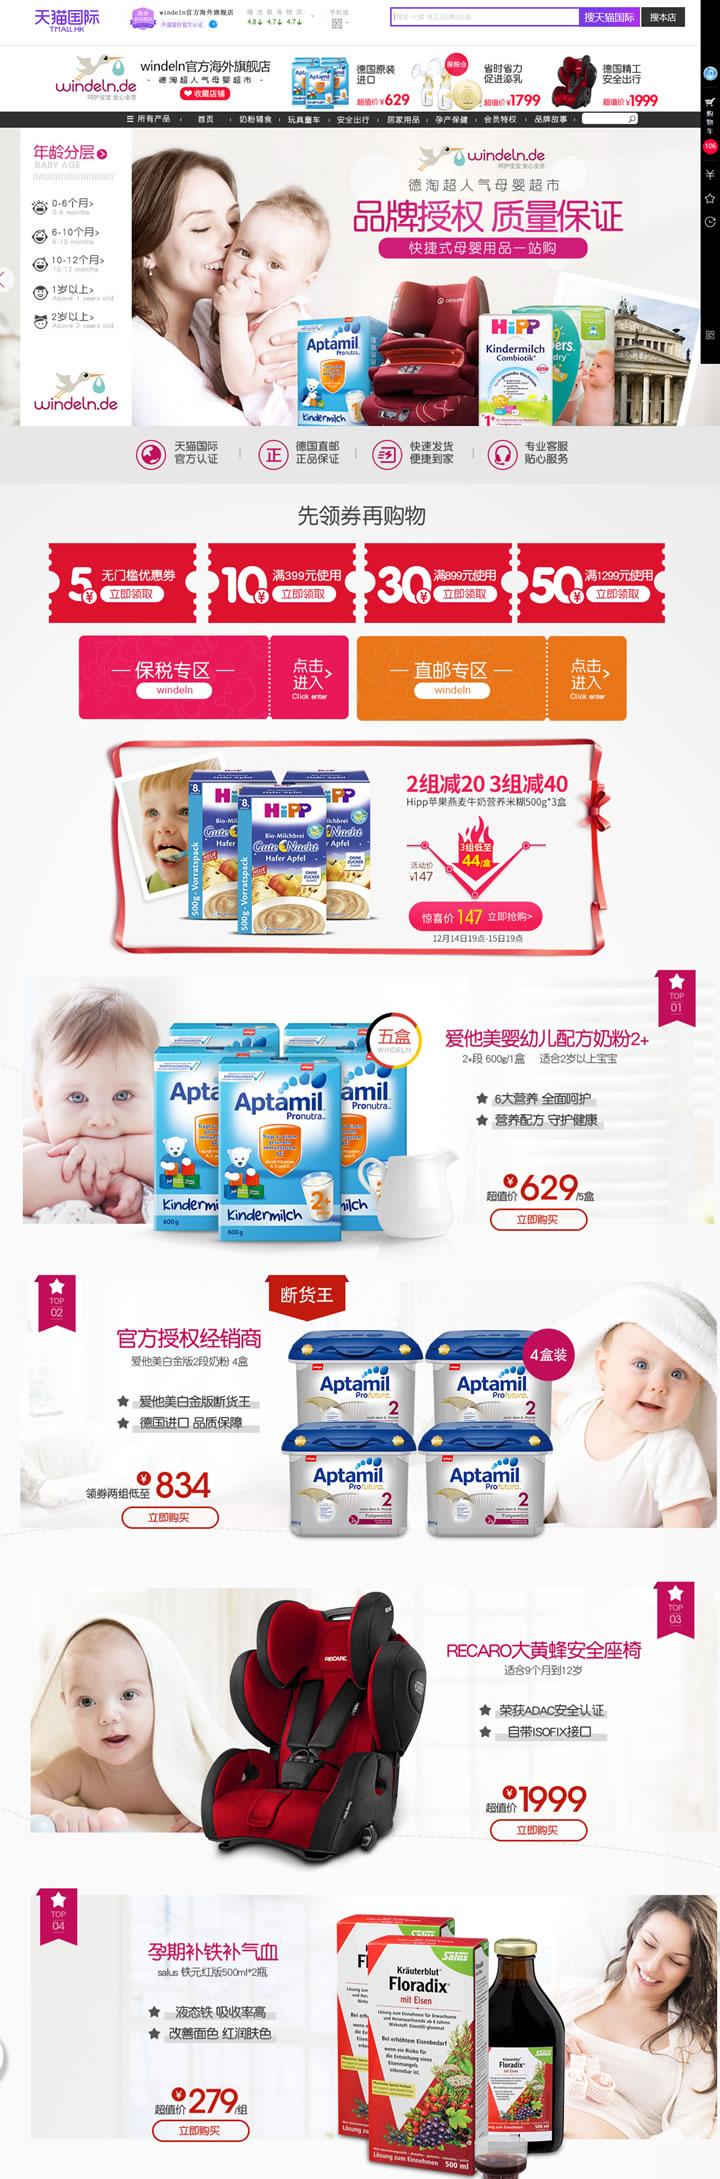 windeln官方海外旗舰店:德淘超人气母婴超市